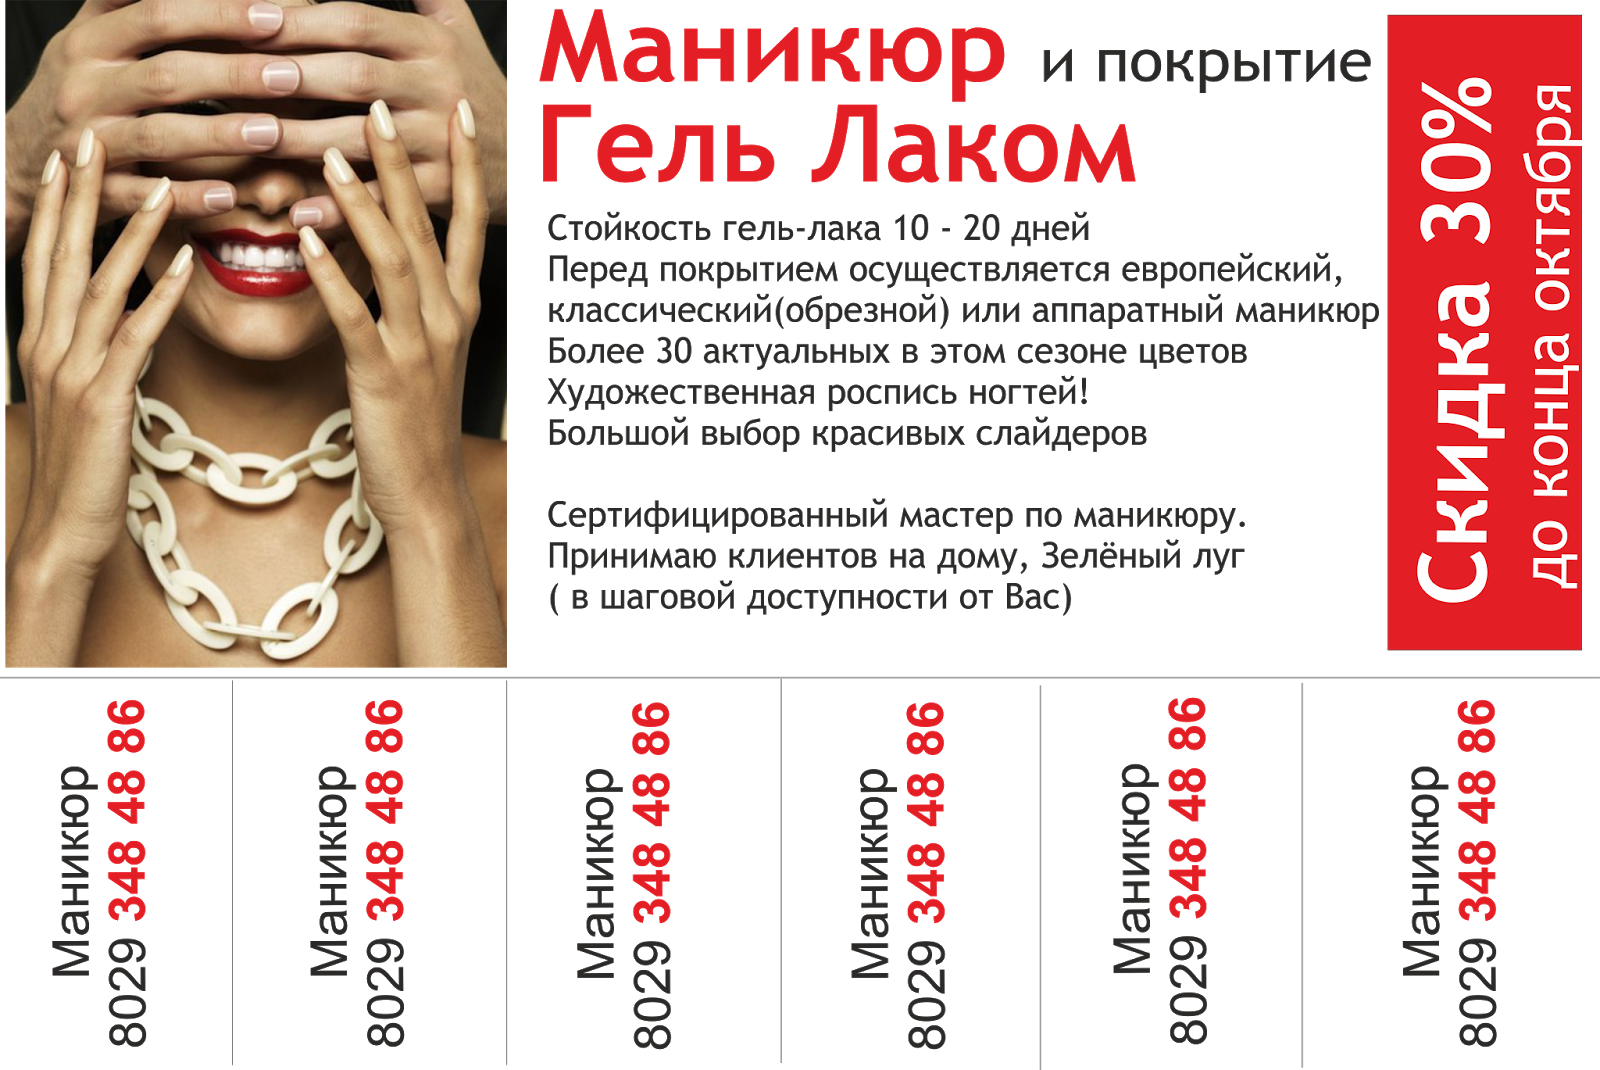 Реклама на листовках маникюр